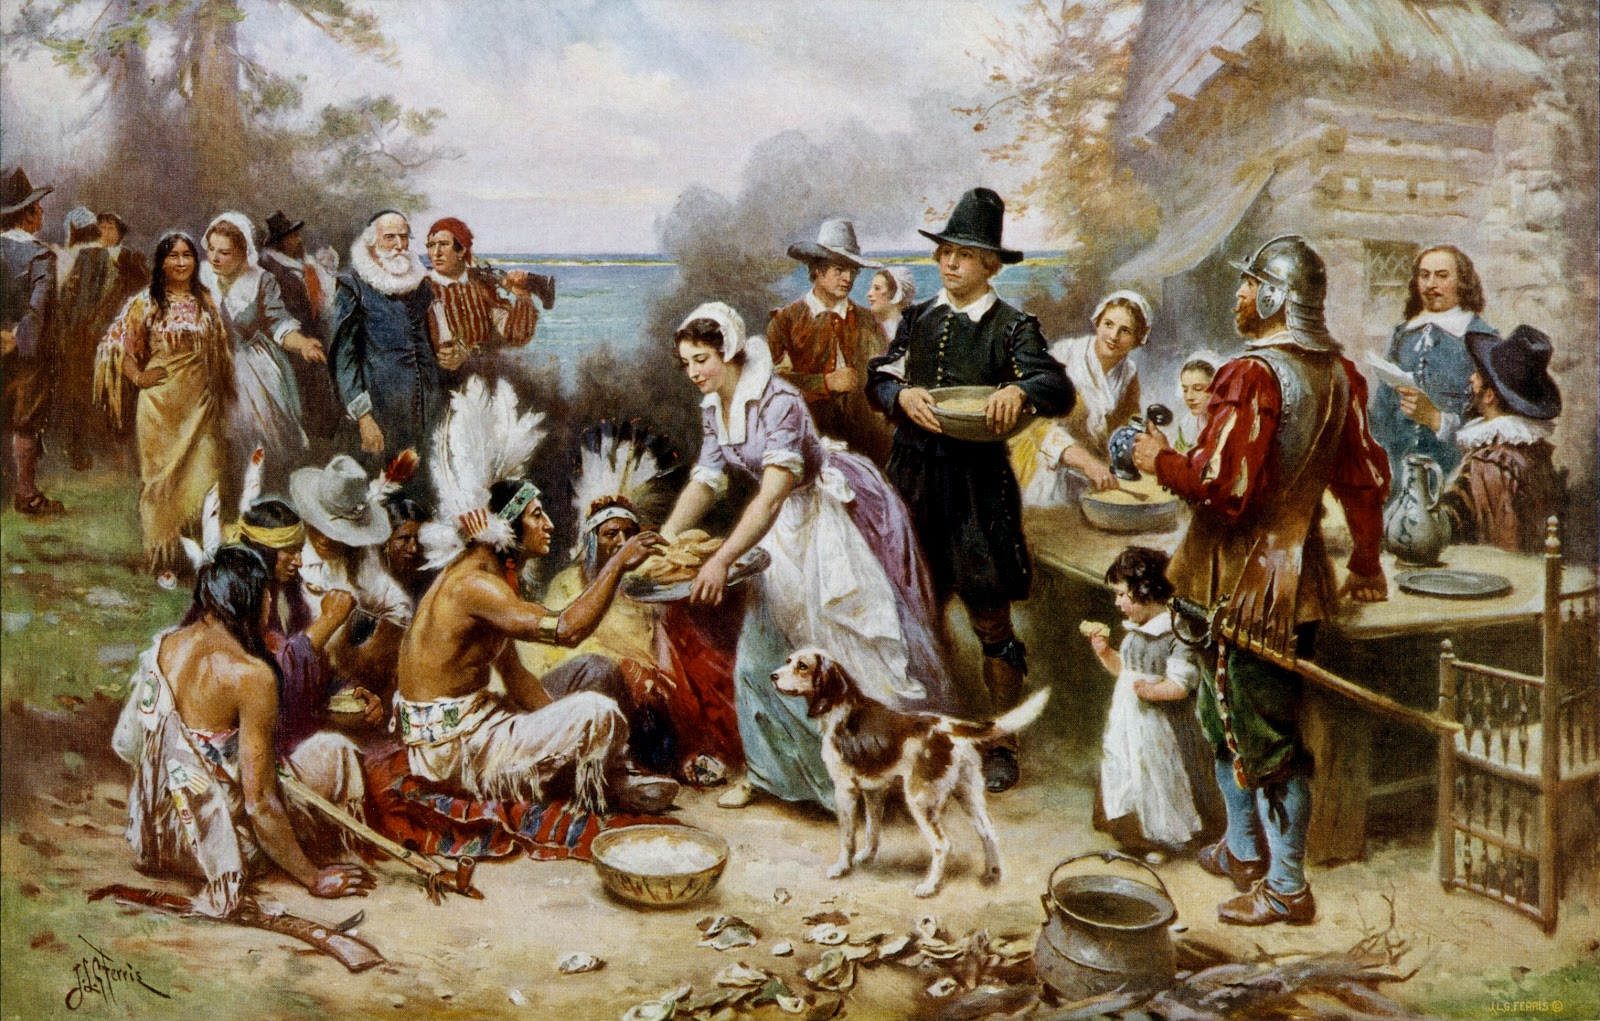 modern times: Pilgrims did